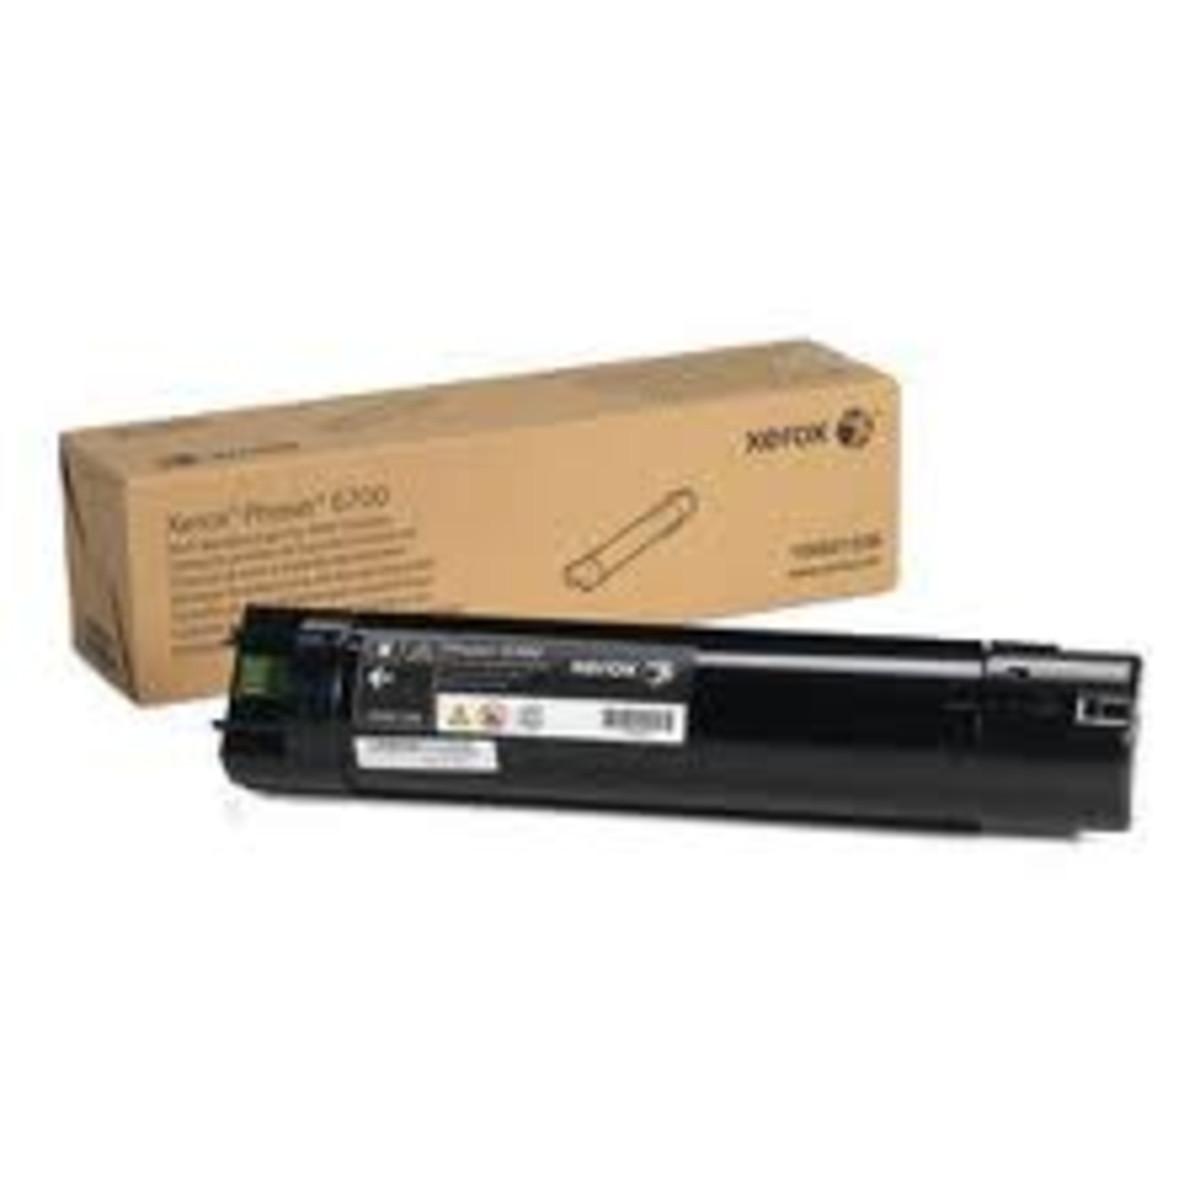 Xerox 106R01518 Black Toner Cartridge